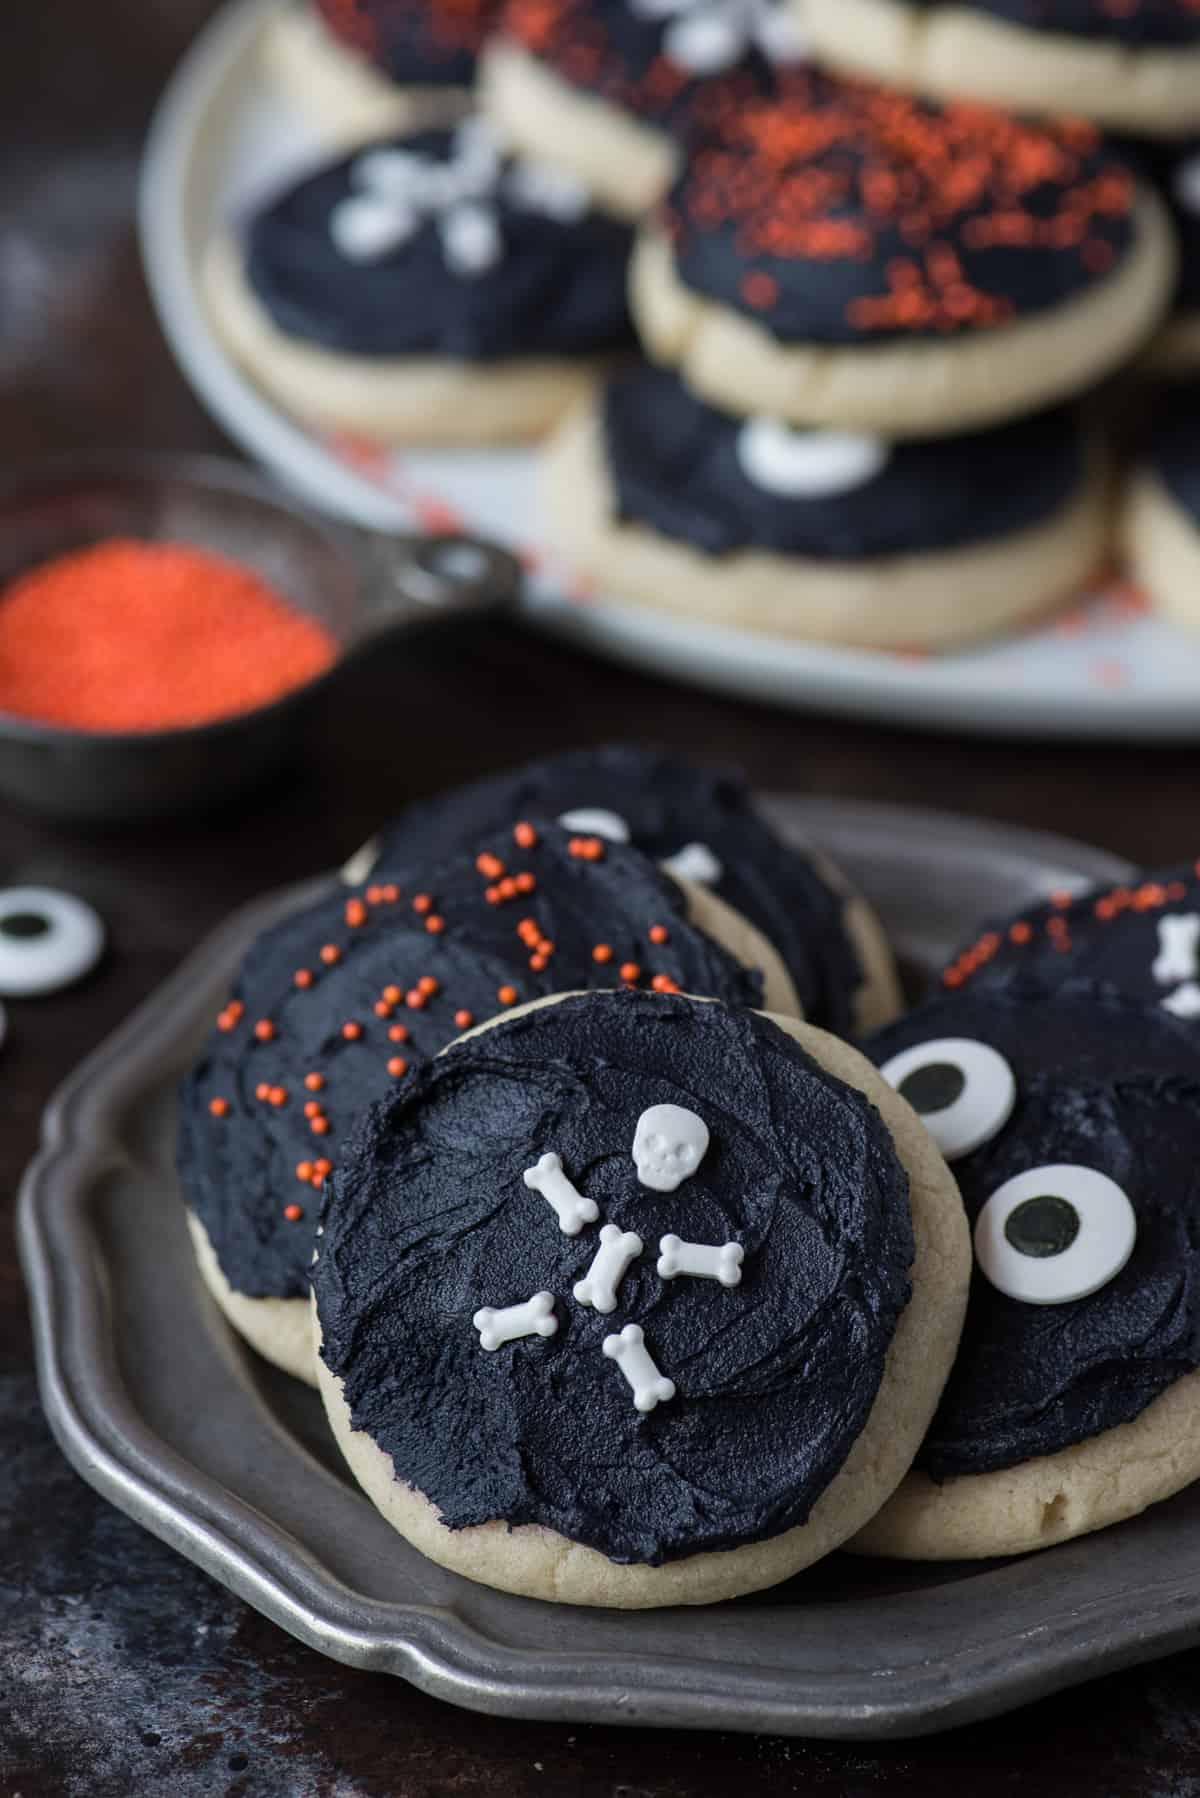 halloween sugar cookies with black frosting and skeleton sprinkles on a metal plate